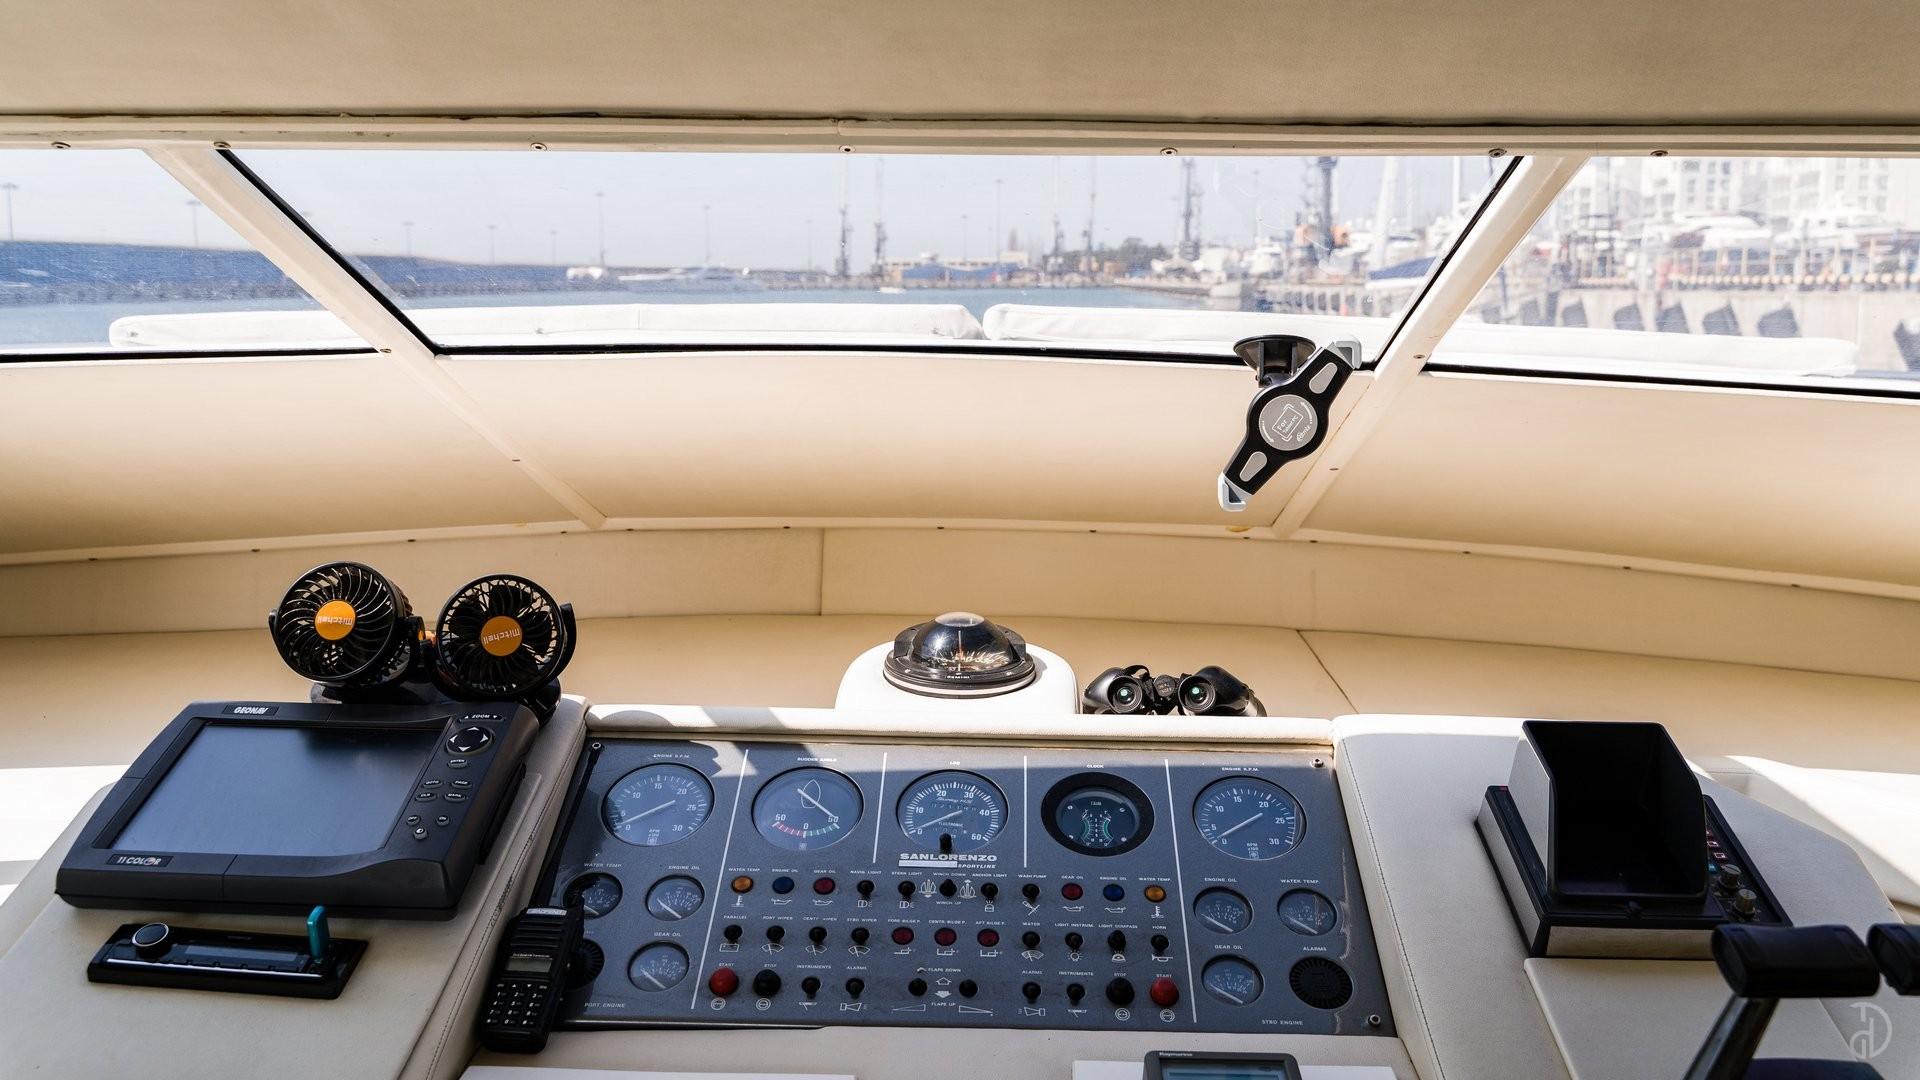 Аренда моторной яхты Sanlorenzo. Фото 6